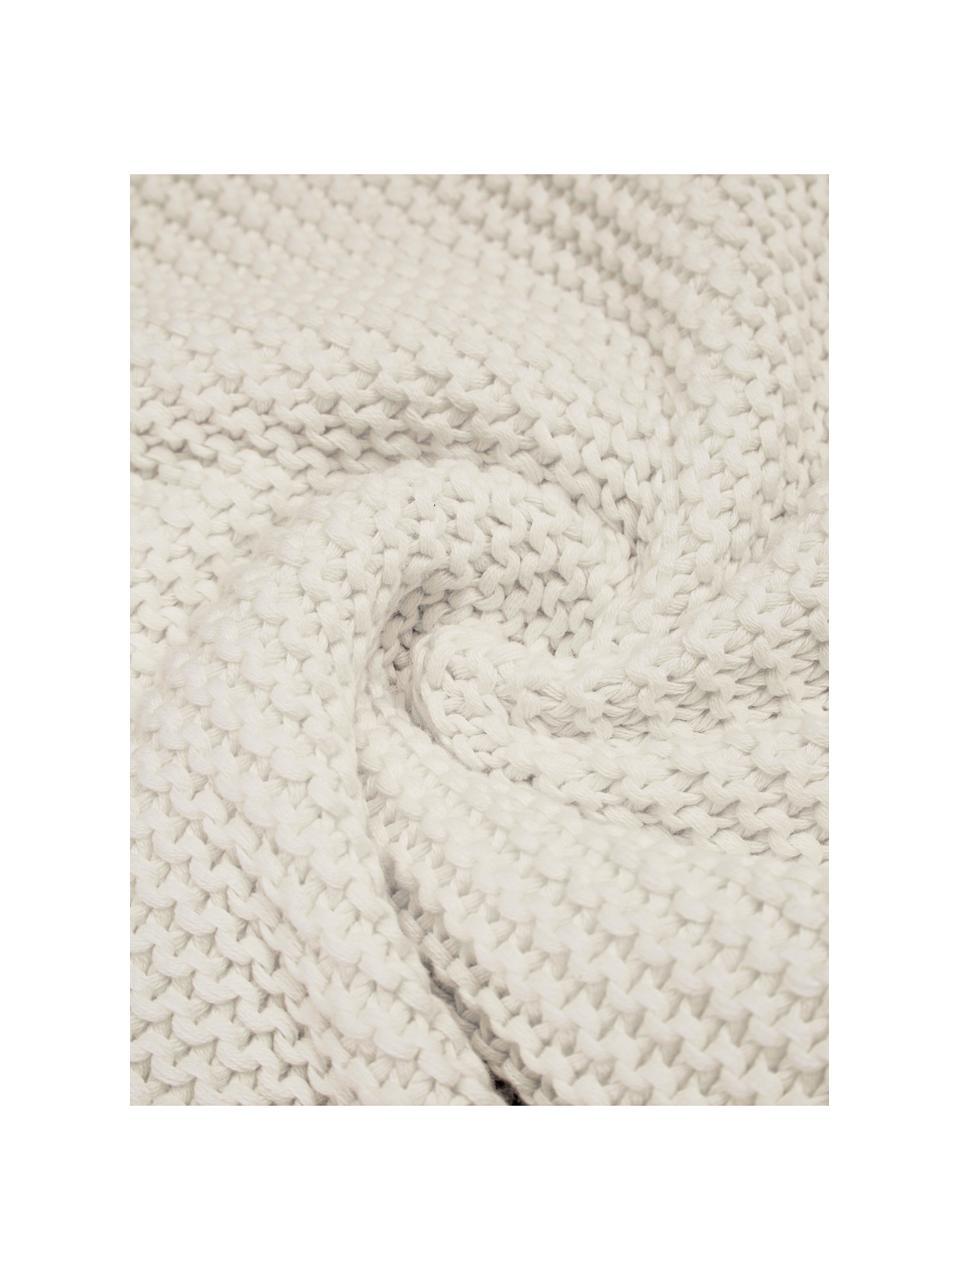 Gebreide plaid Adalyn in natuurwit, 100% katoen, Natuurwit, 150 x 200 cm